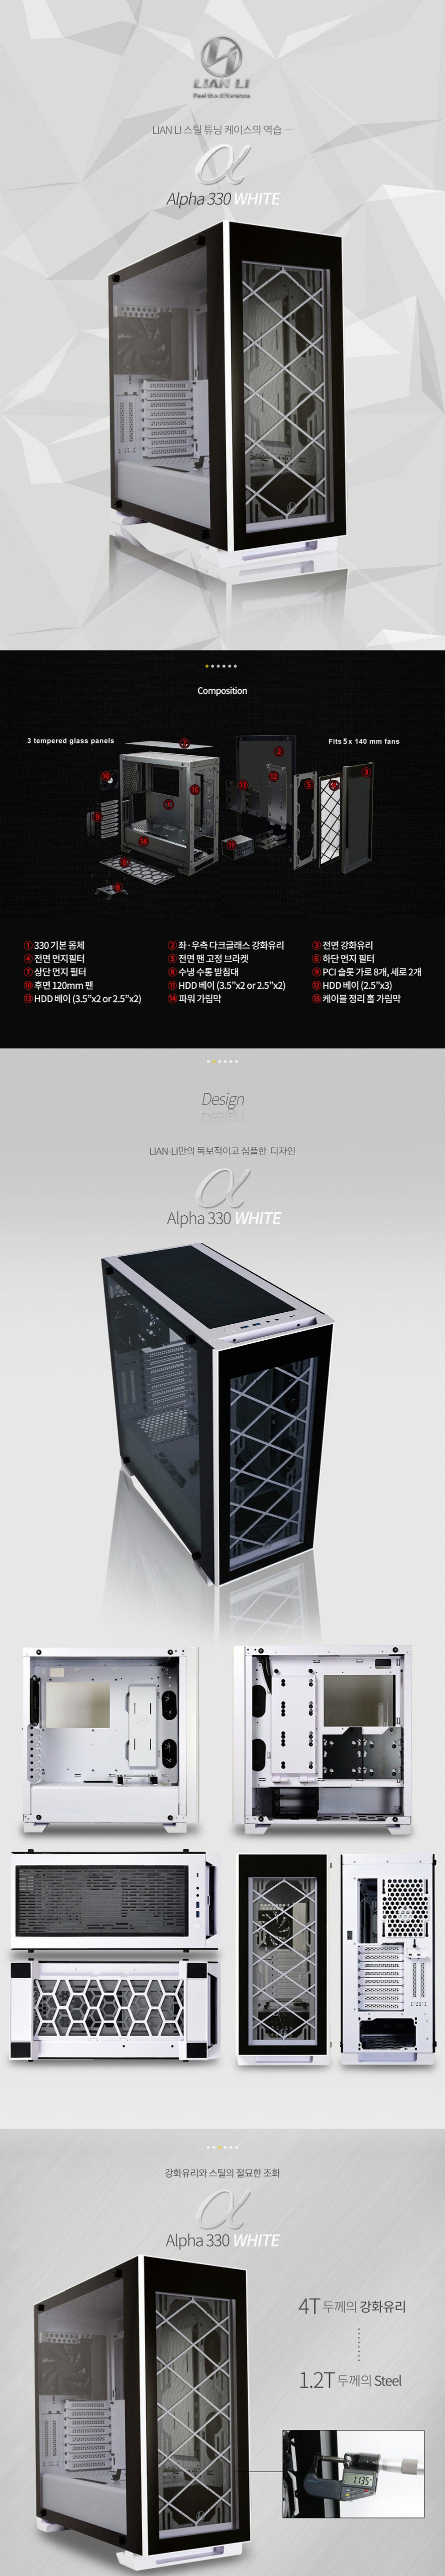 alpha330_white-DB_01.jpg